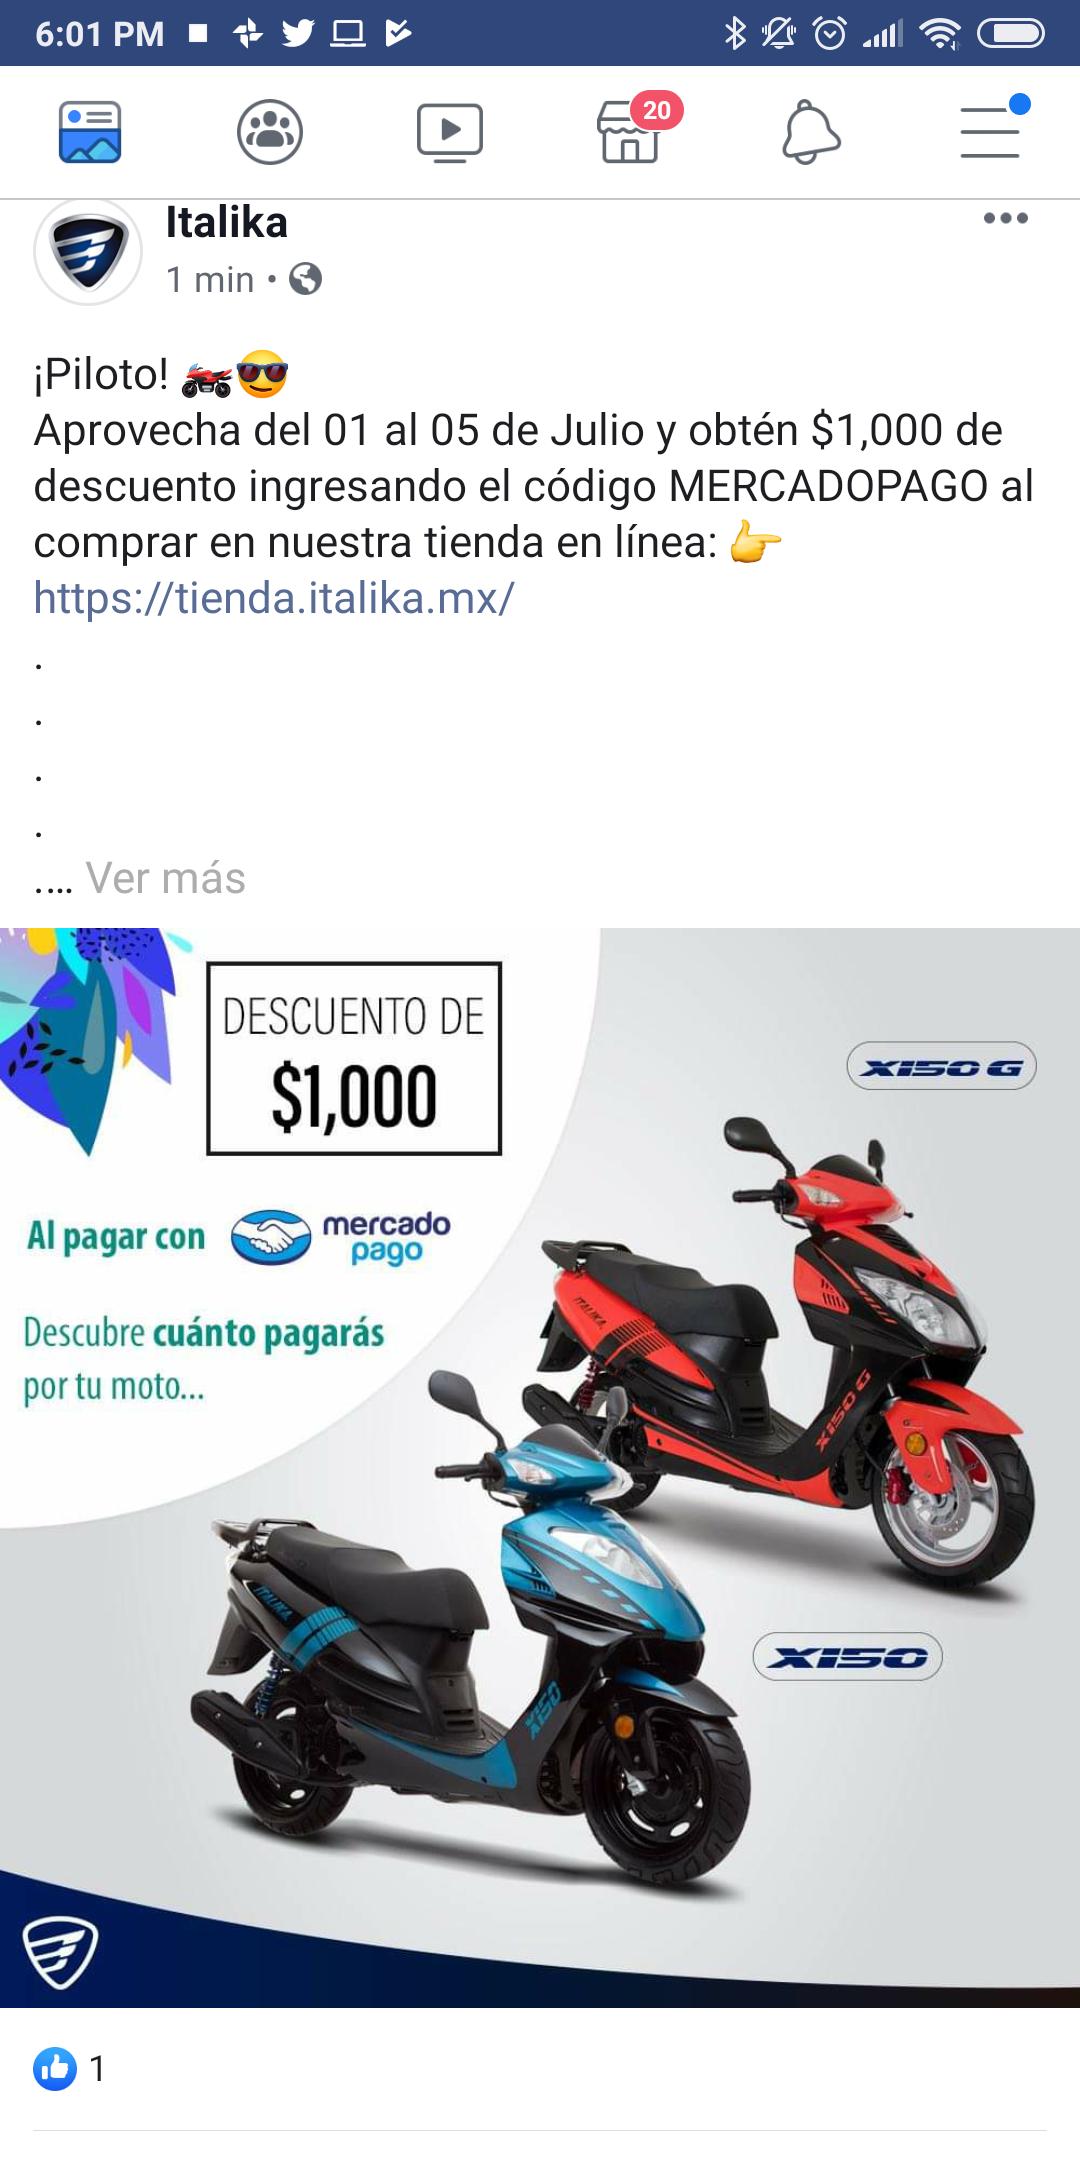 Italika: $1,000 de descuento al pagar con MercadoPago